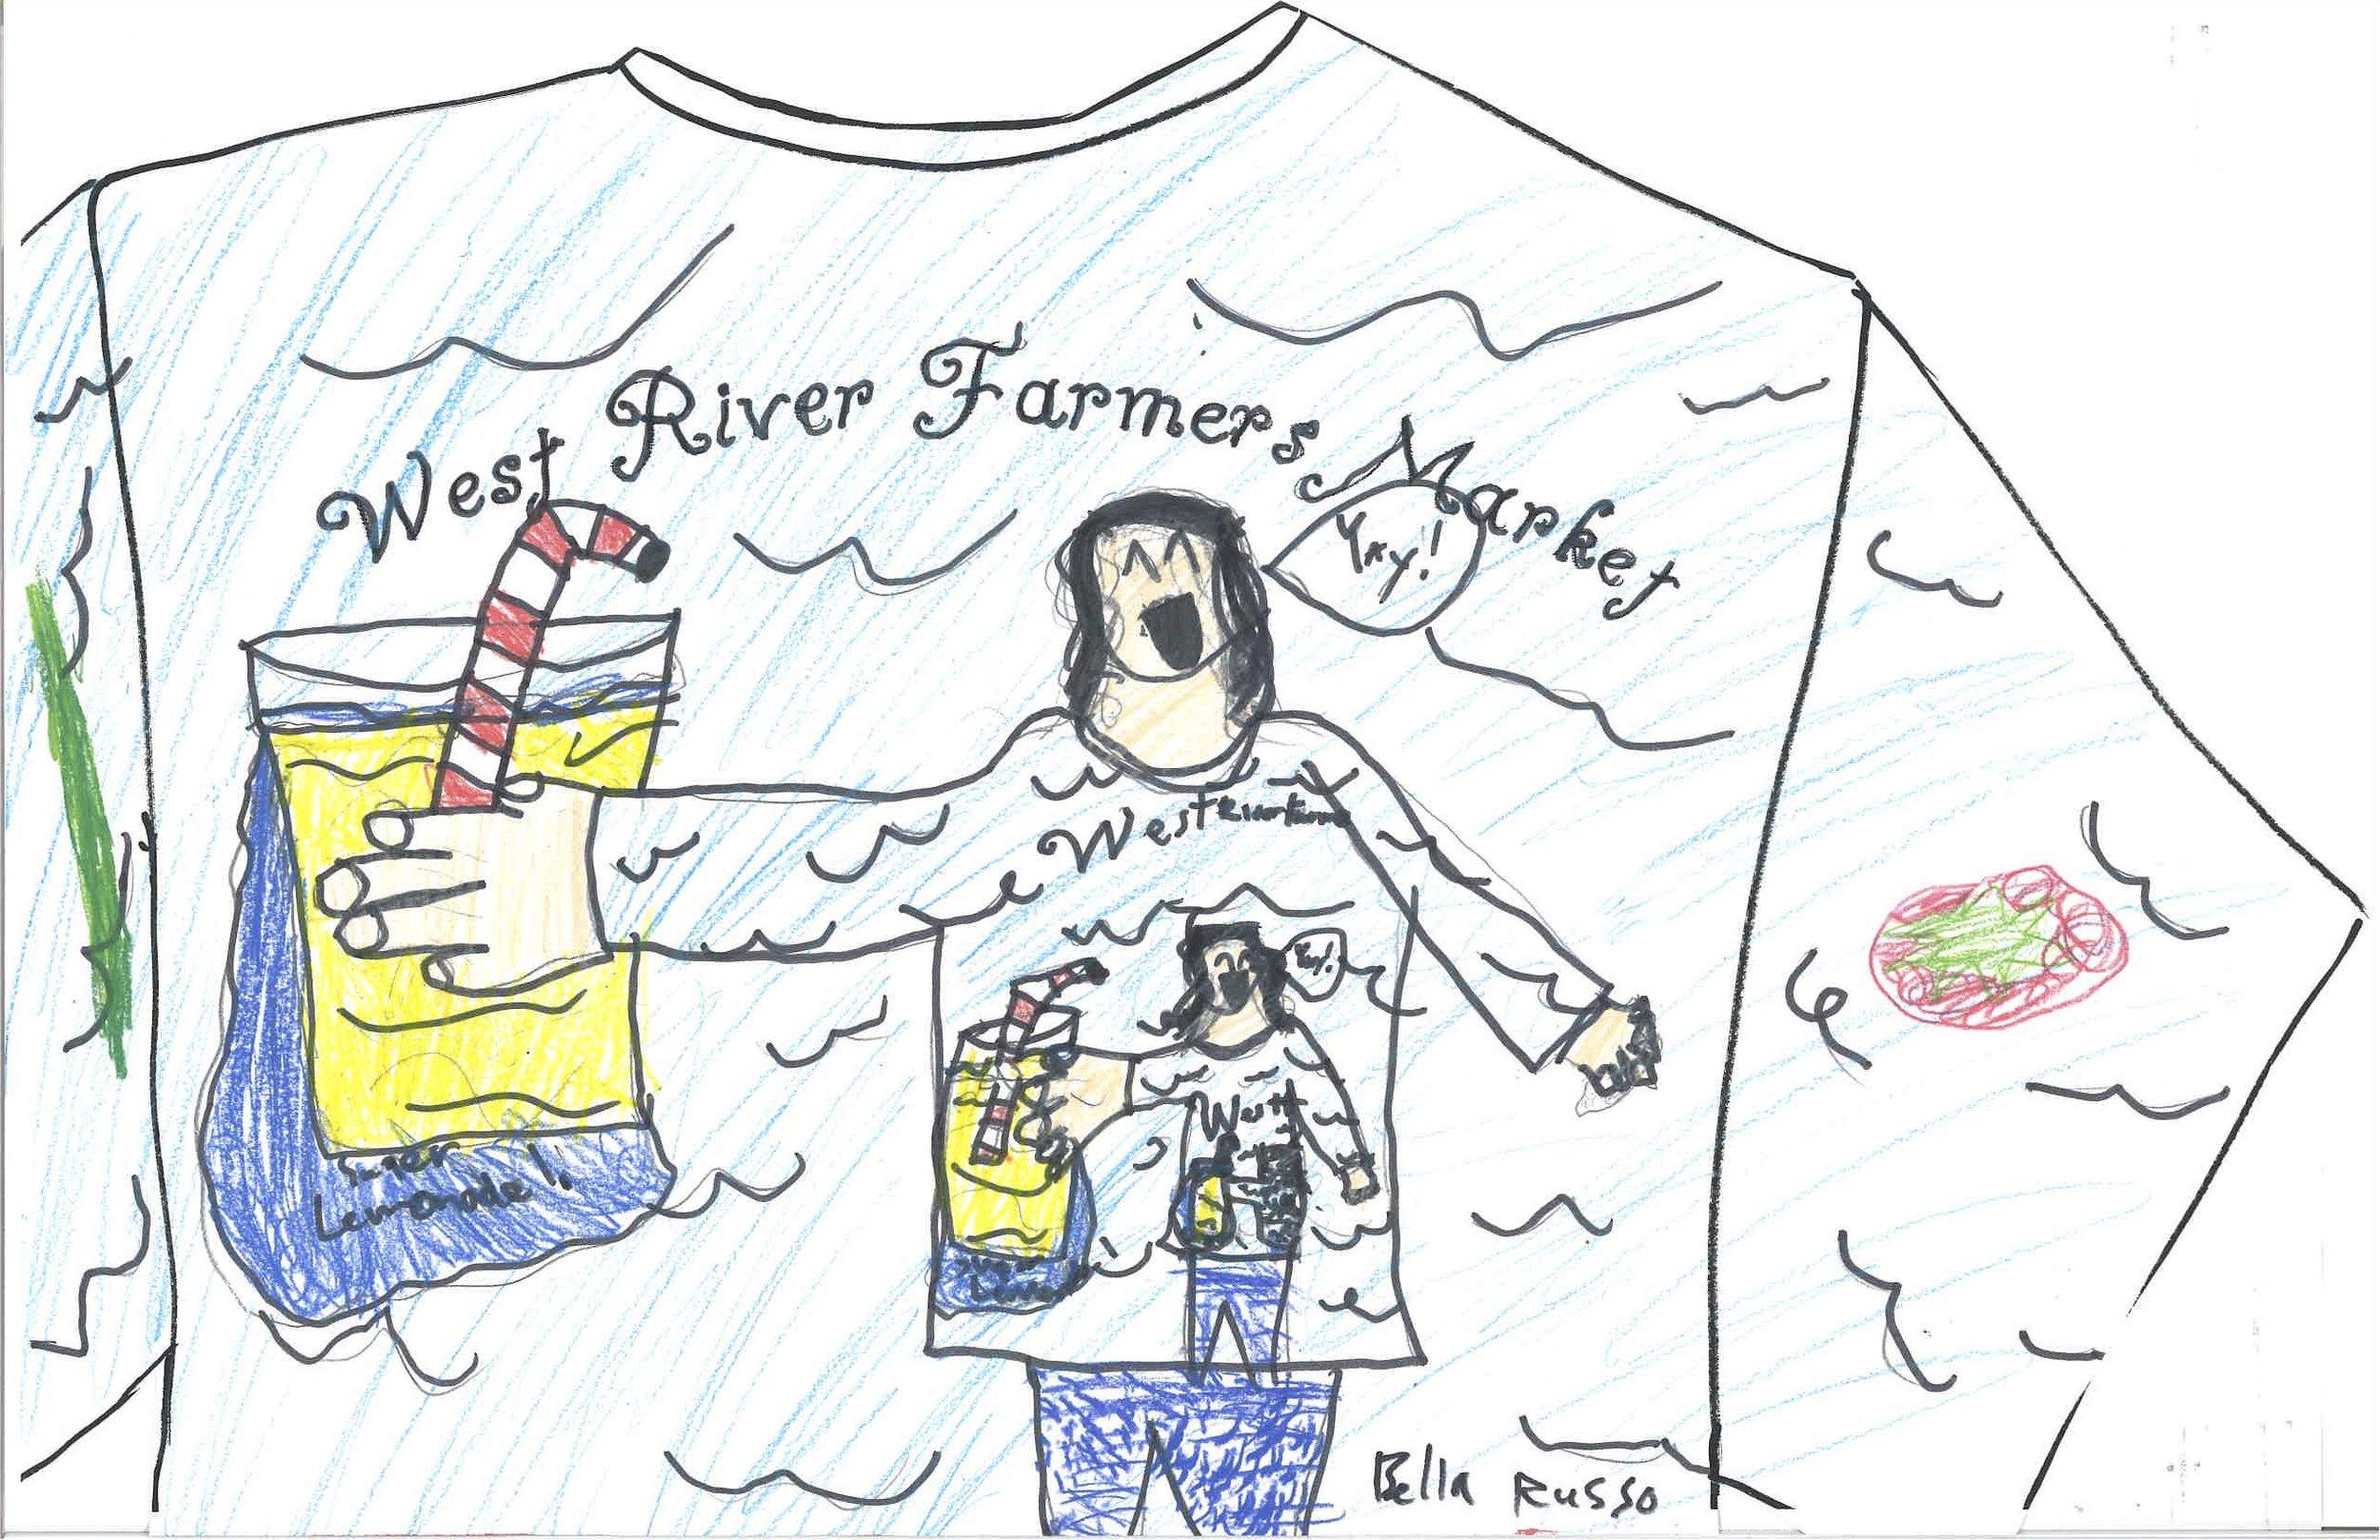 Flood Brook T Shirt Design 18.jpg